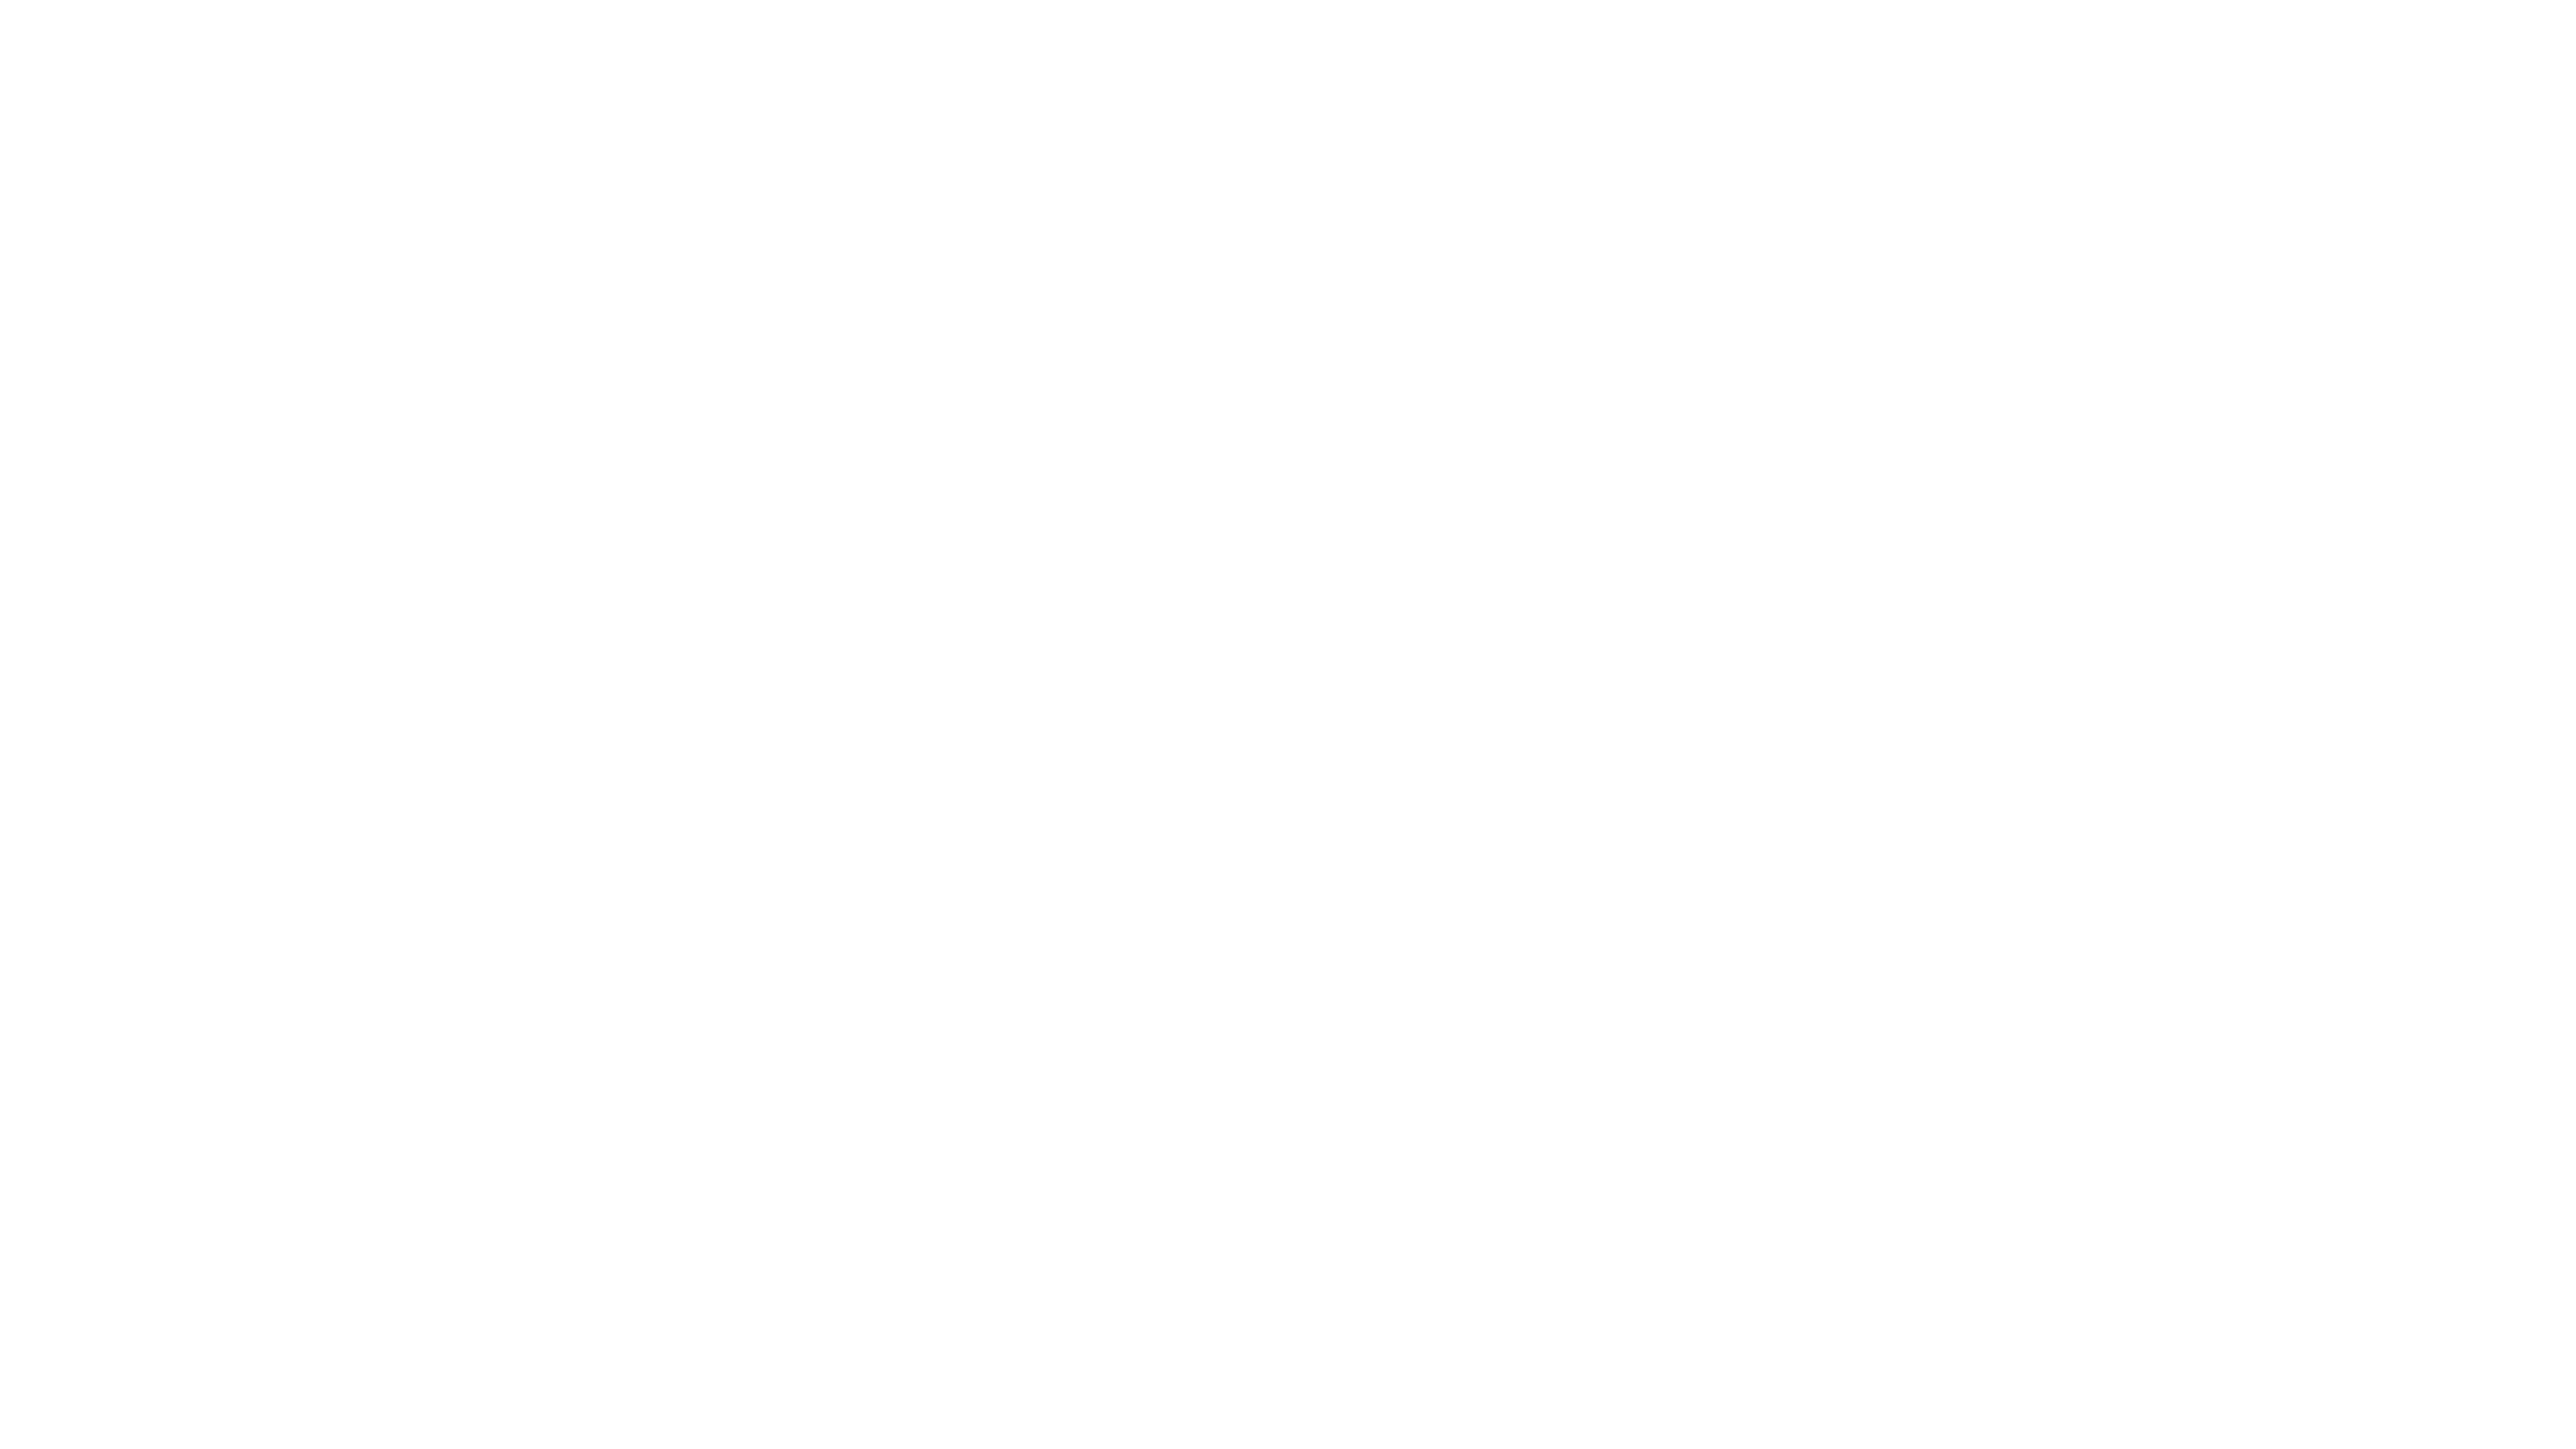 circum-white-text